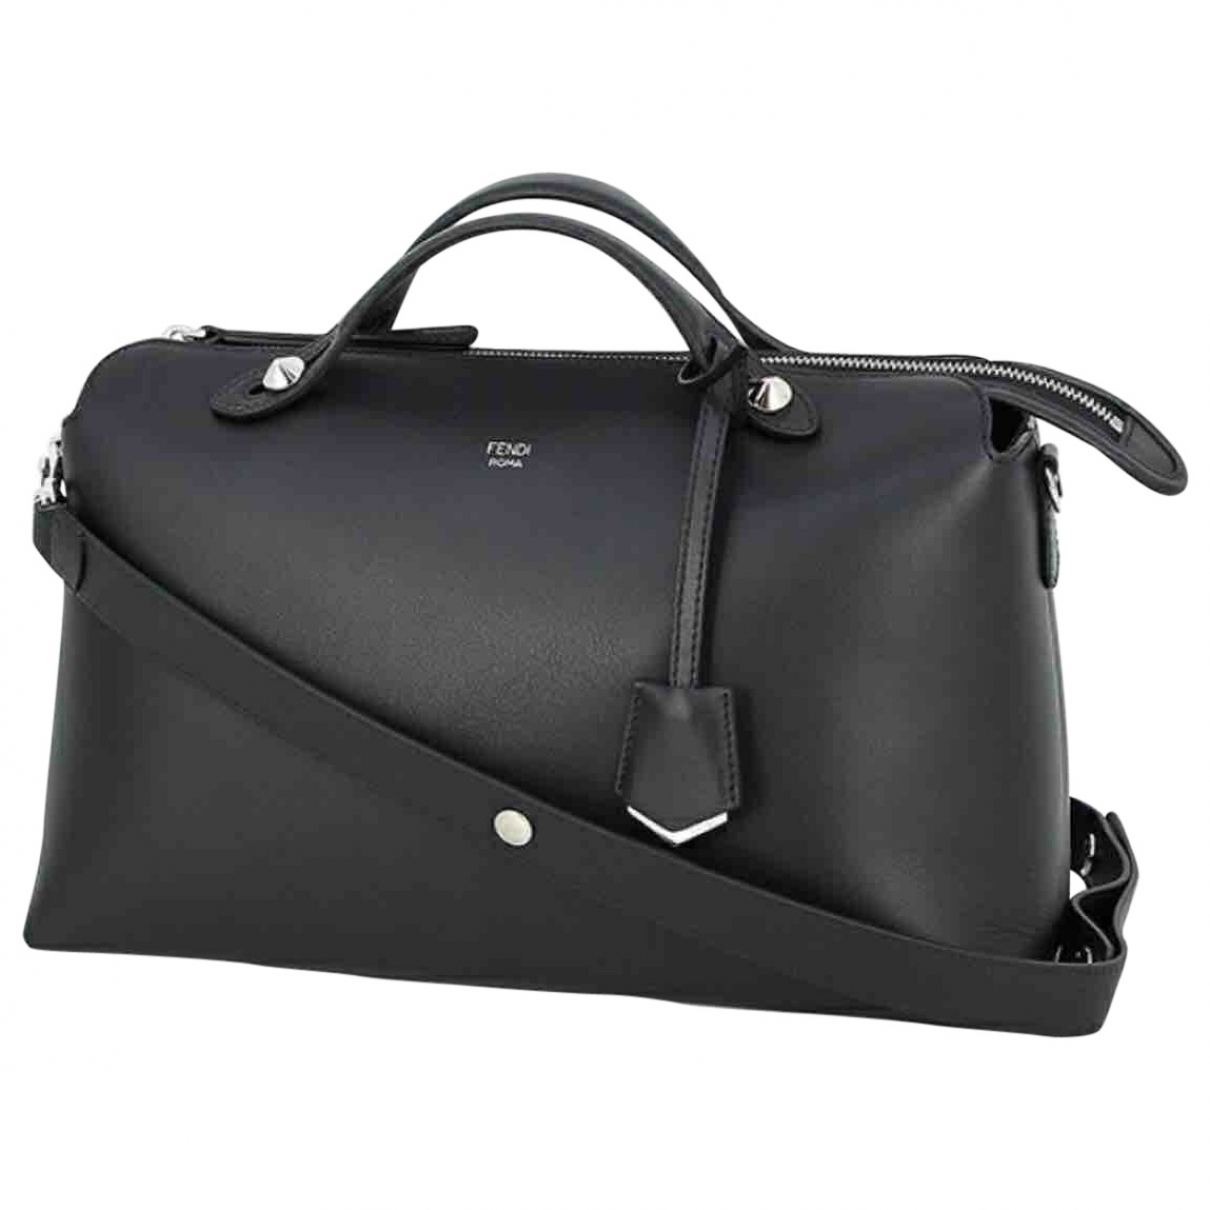 Fendi By The Way  Black Leather handbag for Women \N